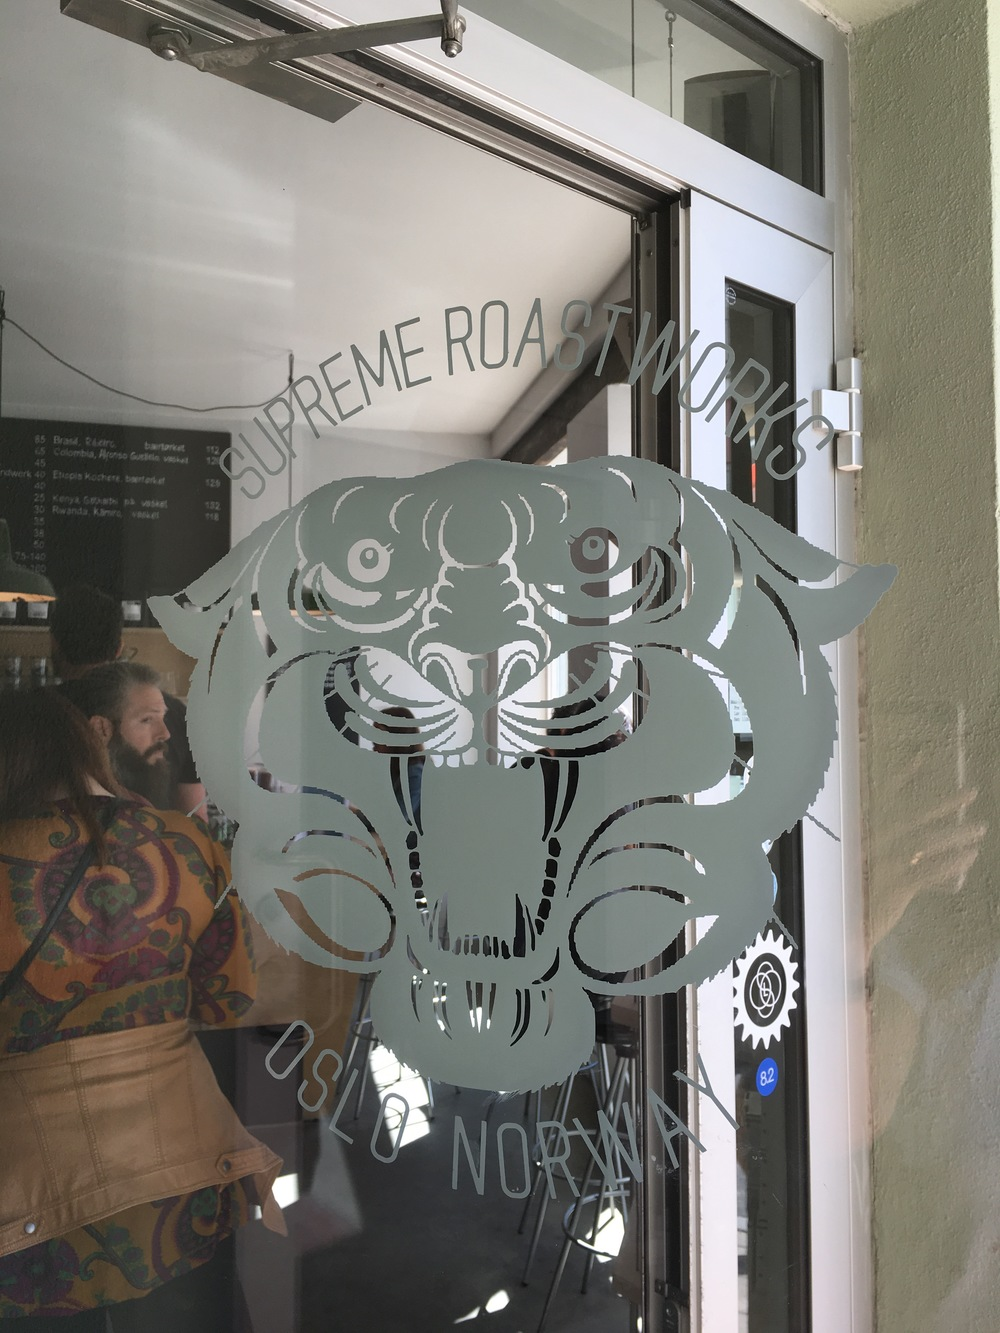 Supreme Roastworks Grünerløkka coffee shop